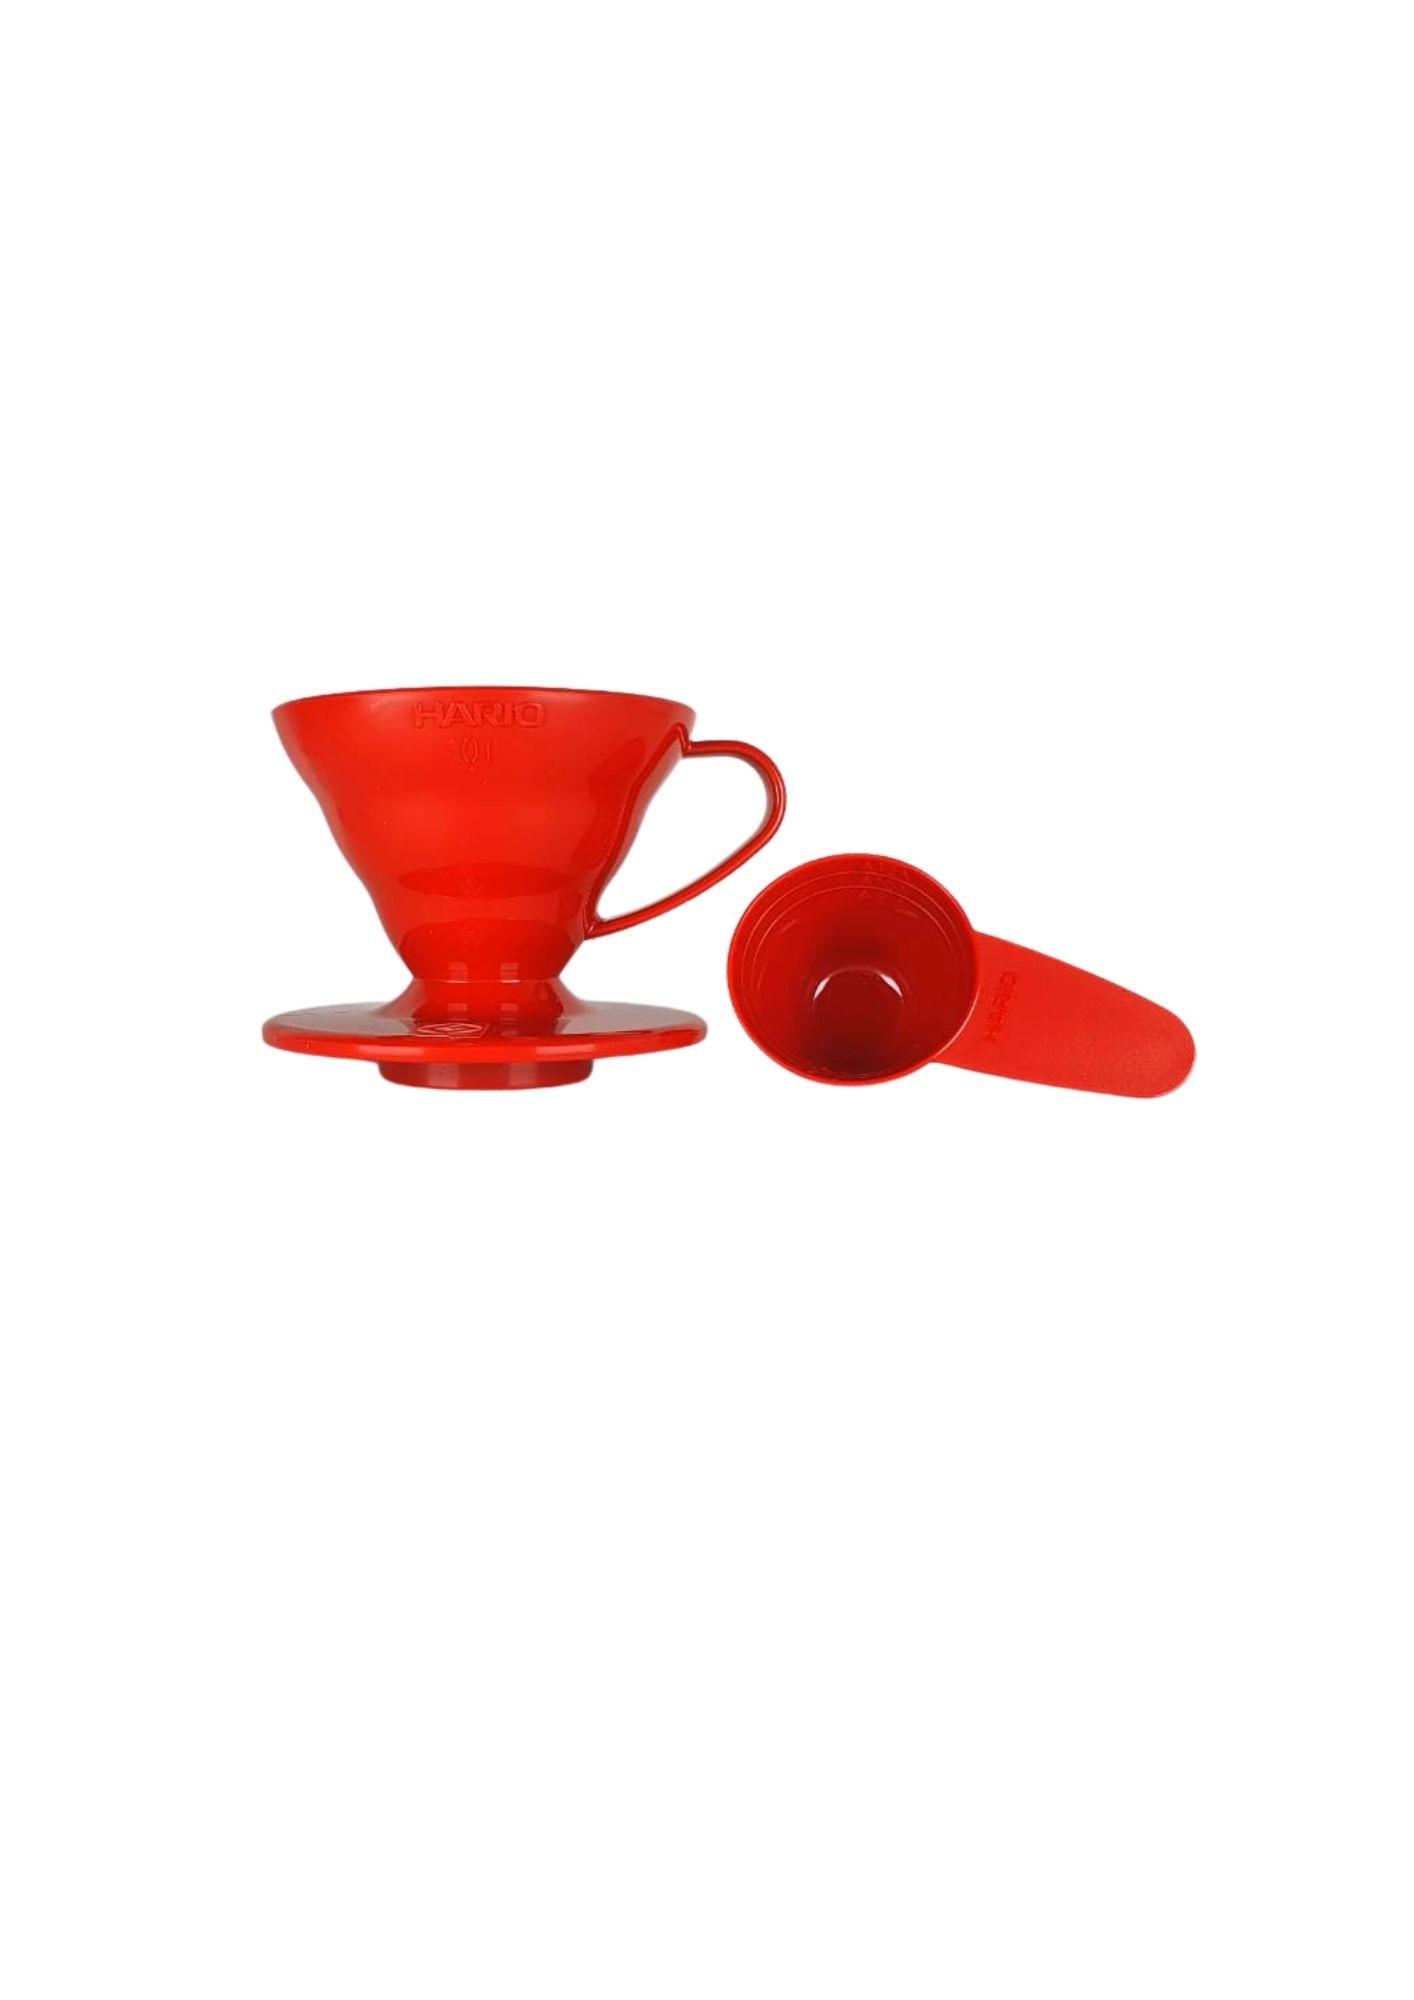 HARIO COADOR DE CAFE V60 01 VD-01 RED